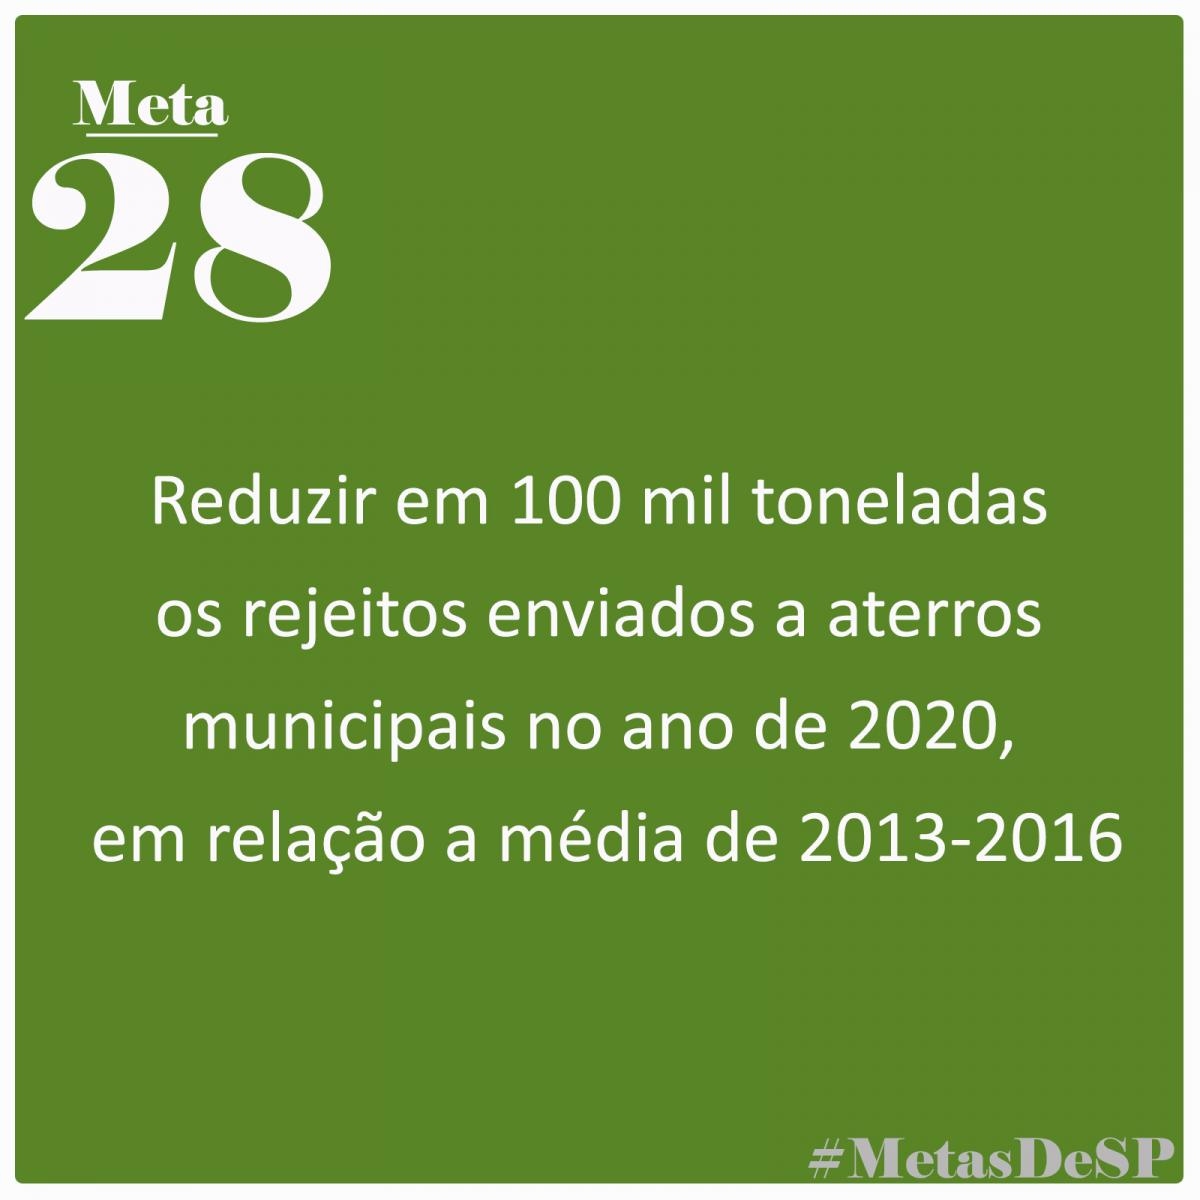 #MetasDeSP: Porquê a meta para resíduos precisa ser revista